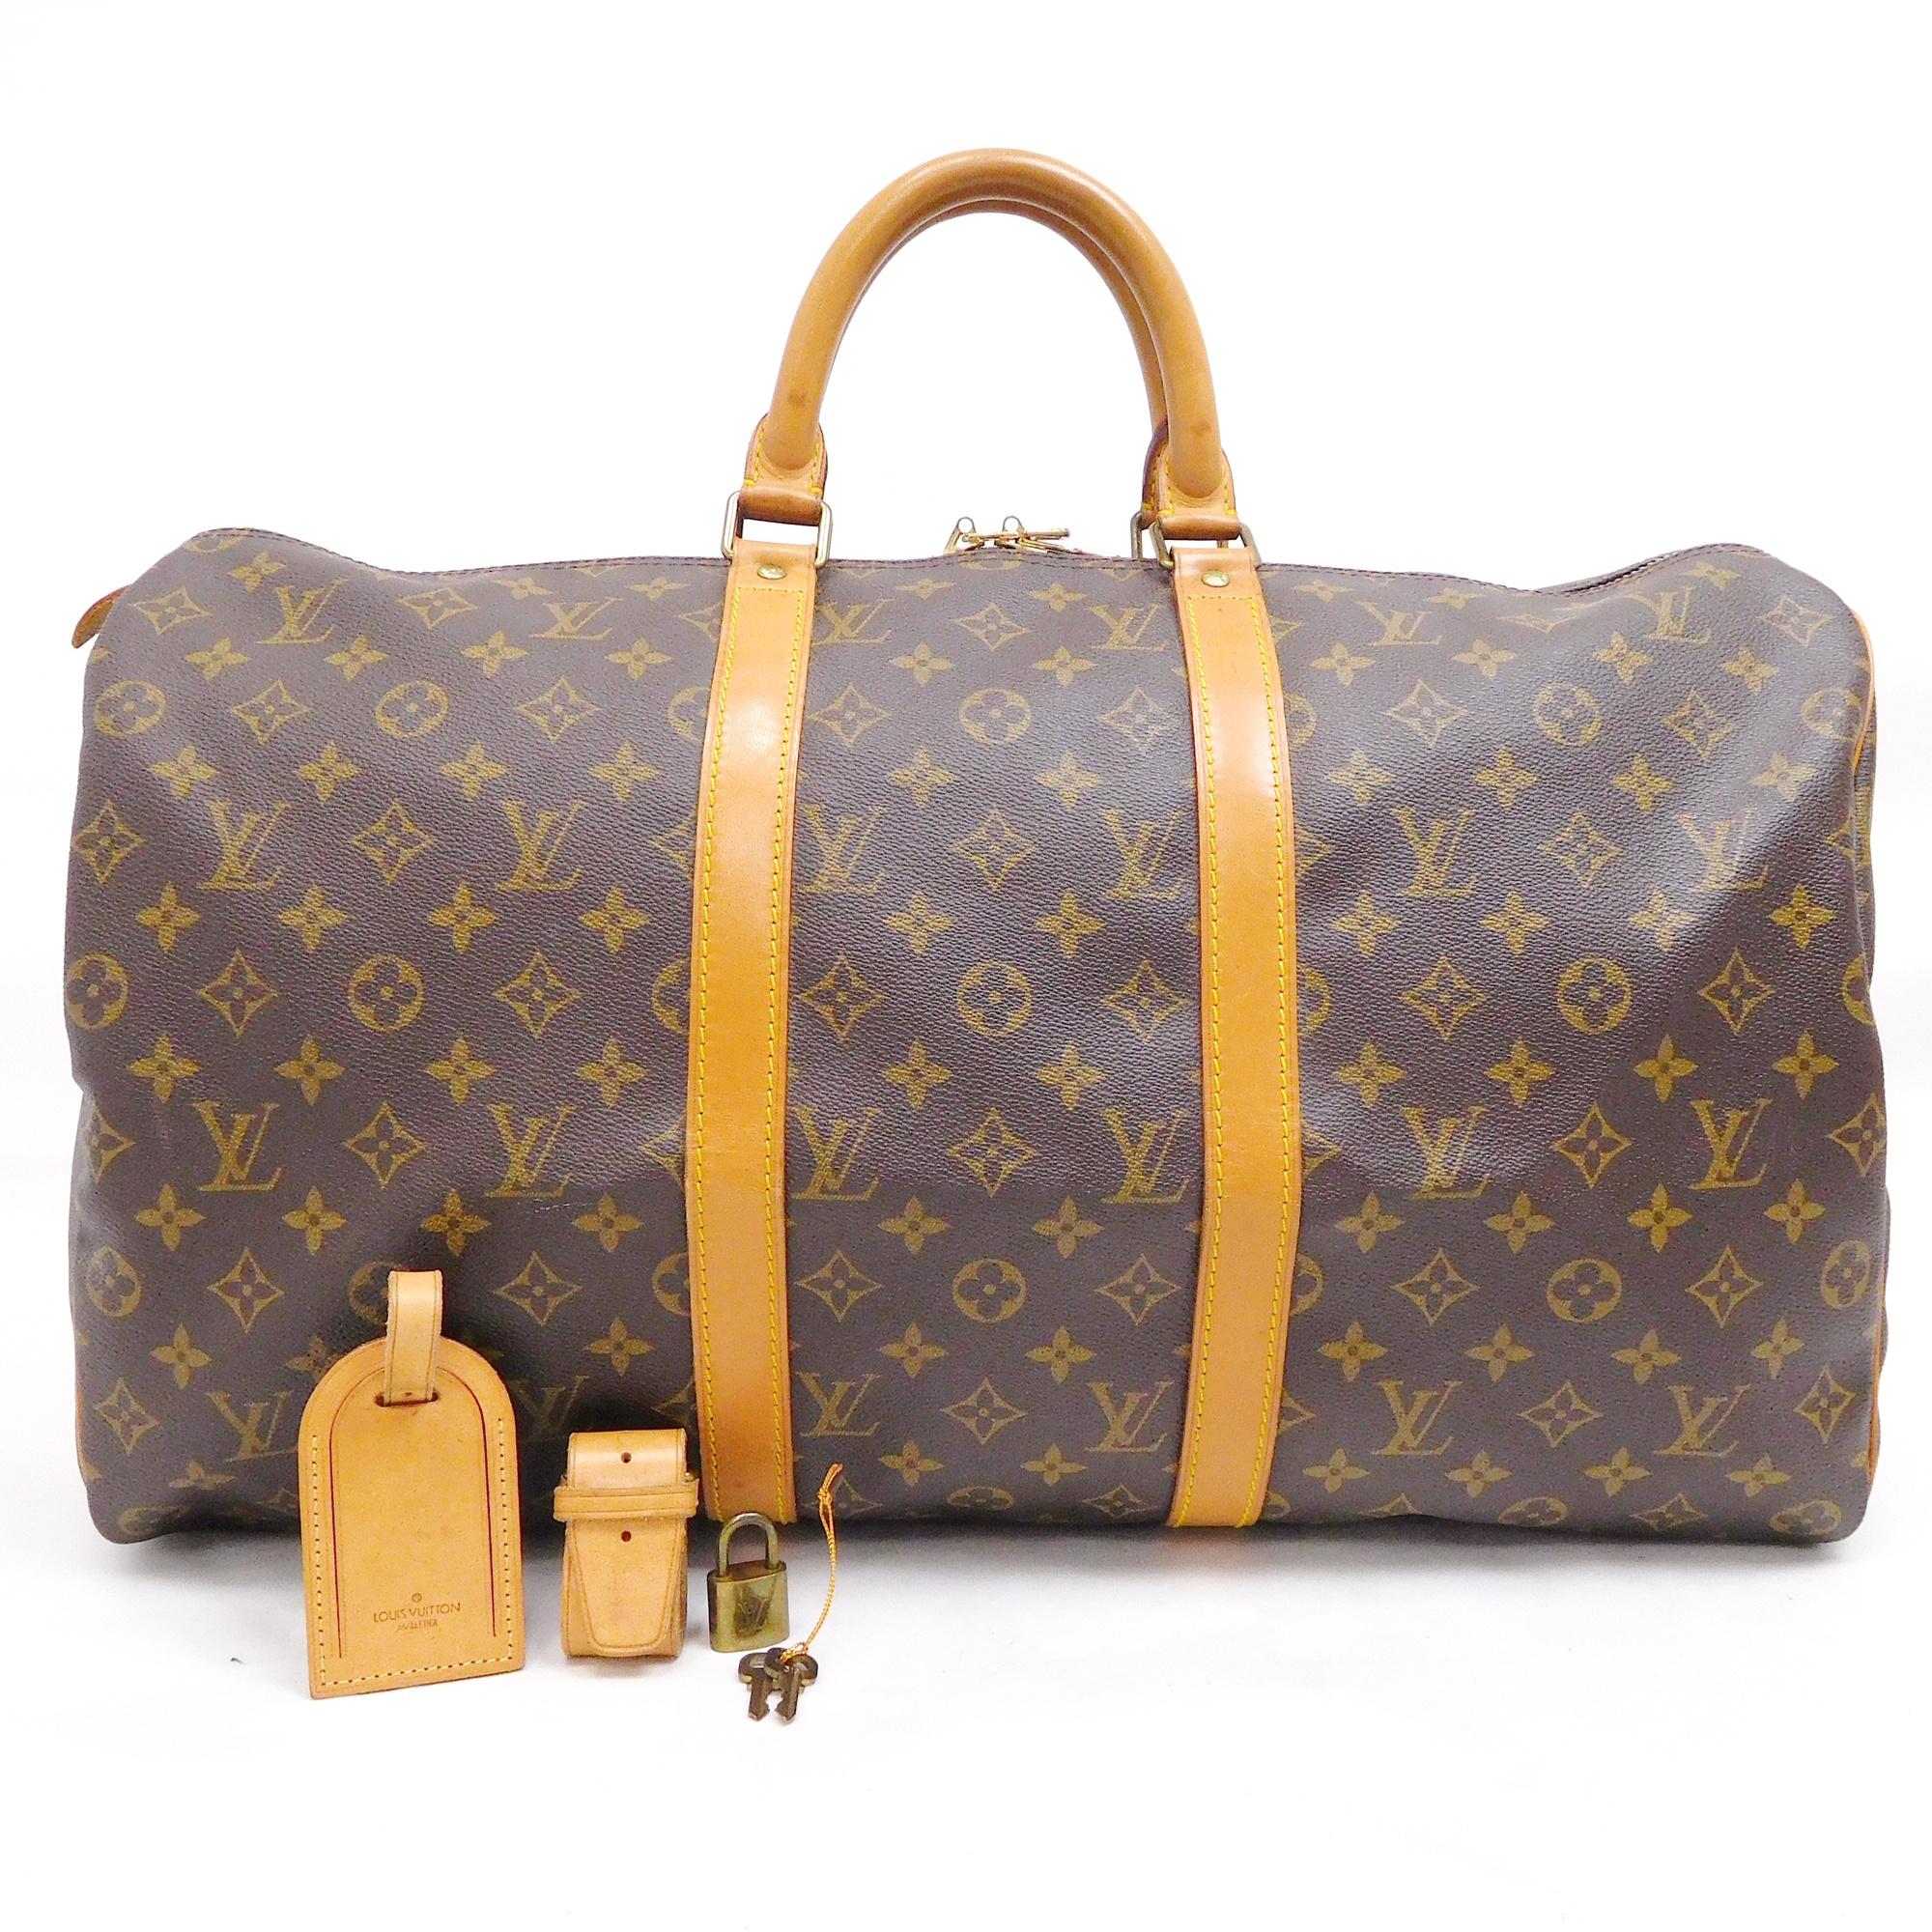 dd2f9d90dcab Auth Louis Vuitton Monogram Keepall 50 M41426 Malletier Women s Boston Bag  Brown